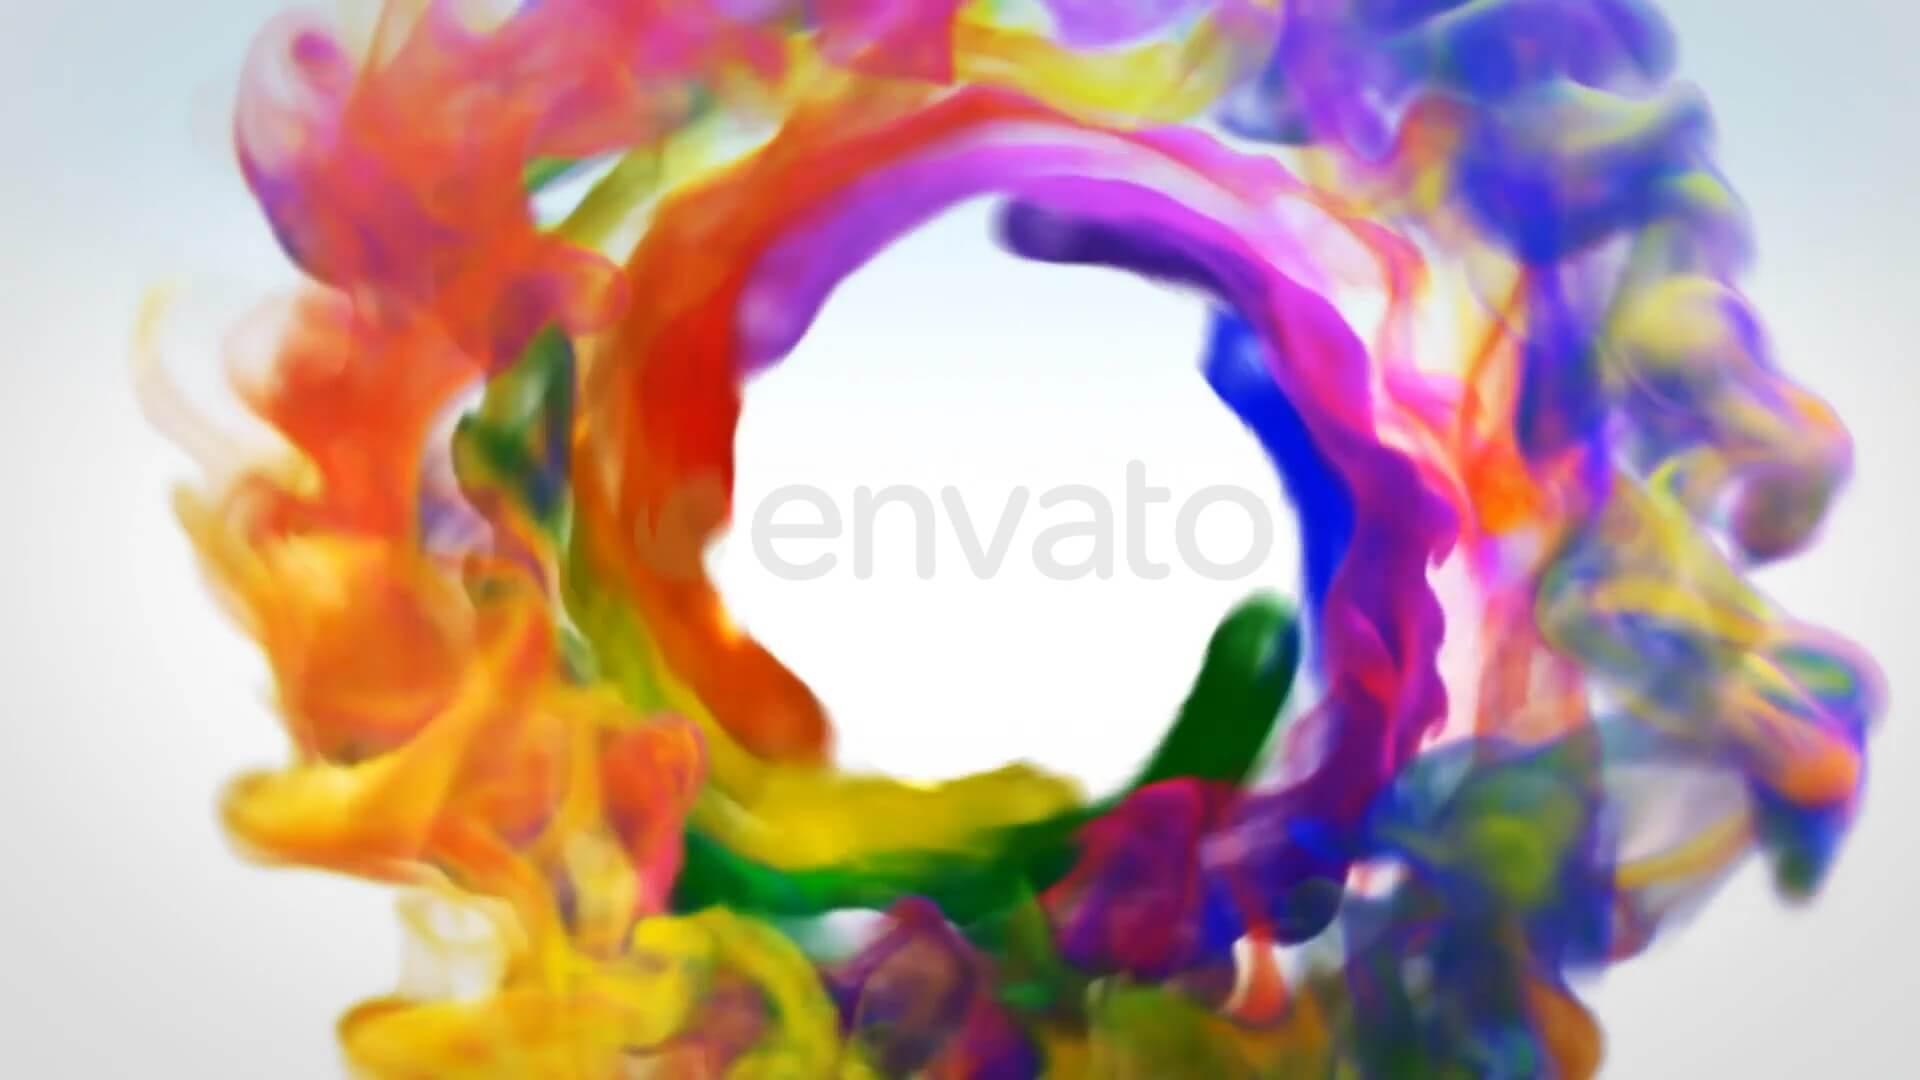 fcpx主题模板 彩色烟雾特效LOGO徽标展示片头 Colorful Smoke Logo Reveal